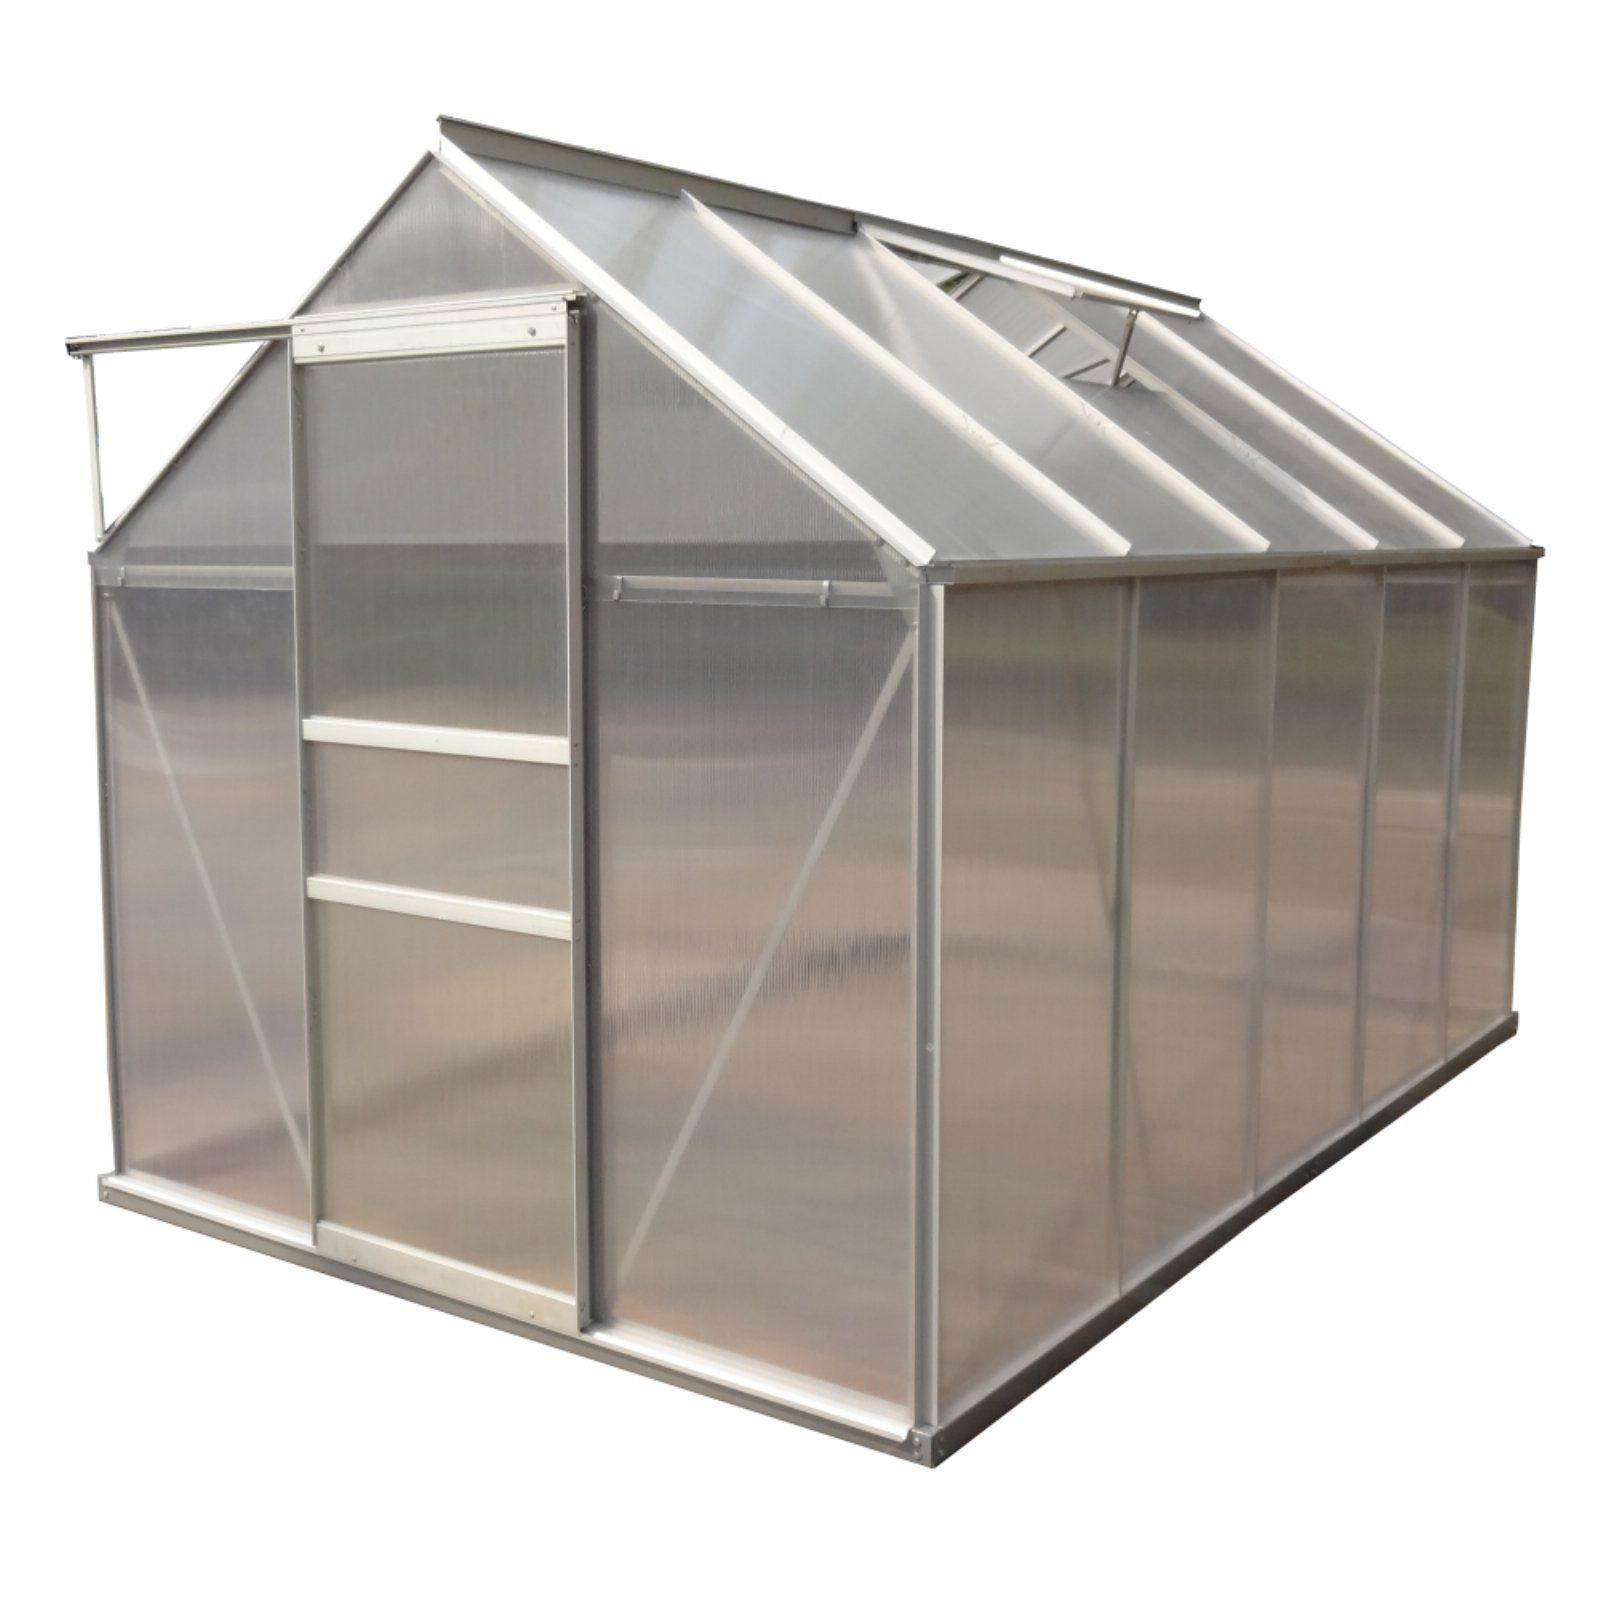 Aleko Walk In Greenhouse | Polycarbonate Greenhouse serapportantà Serre Polycarbonate 12M2